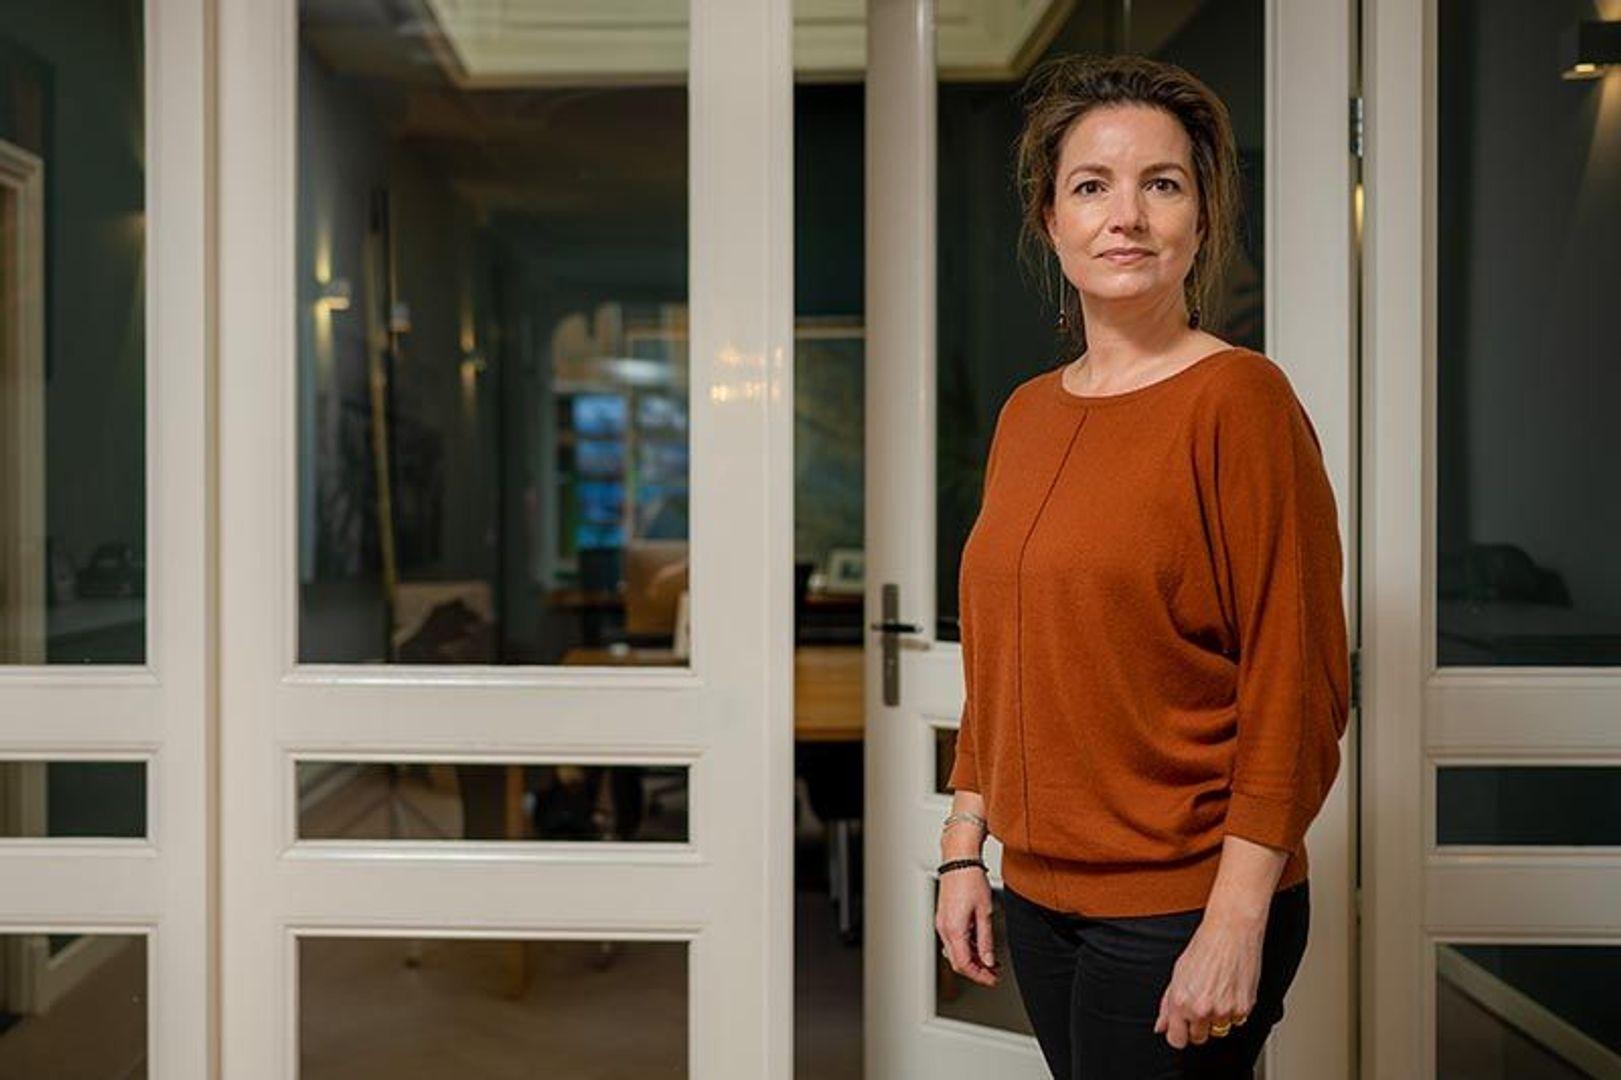 Nanette van Bosse